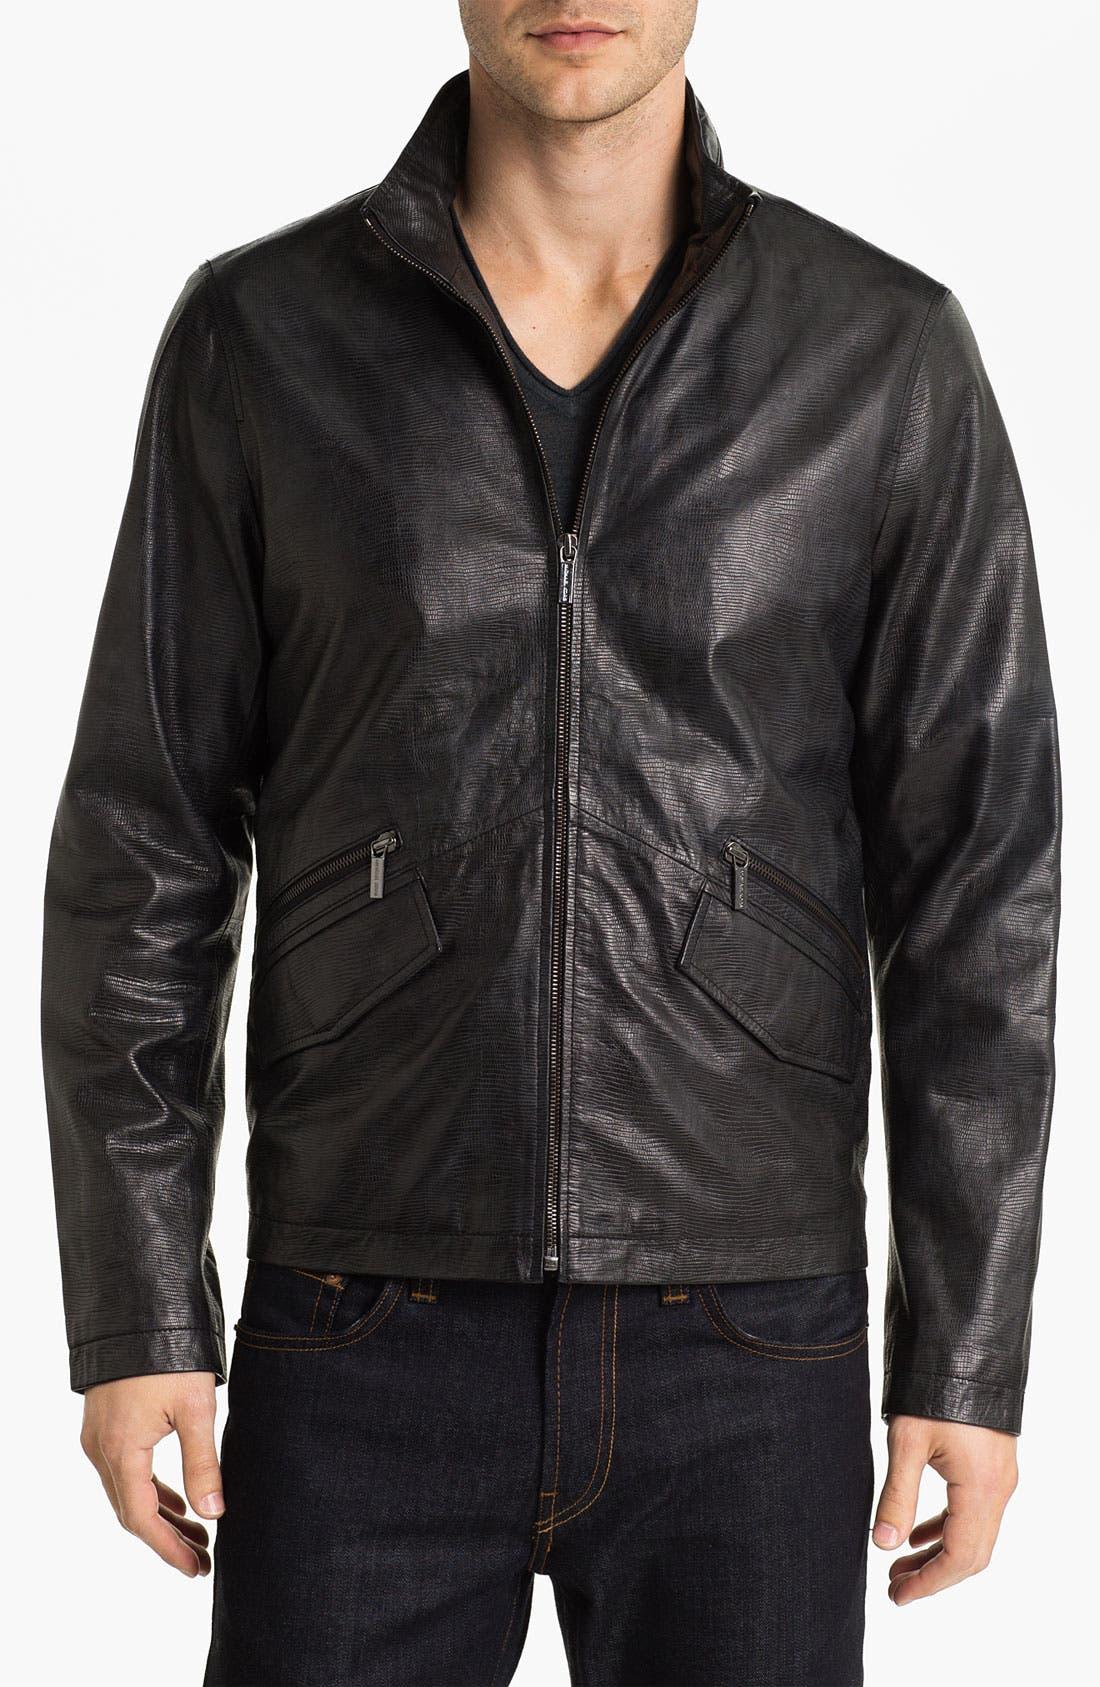 Main Image - Michael Kors Embossed Leather Jacket (Online Exclusive)